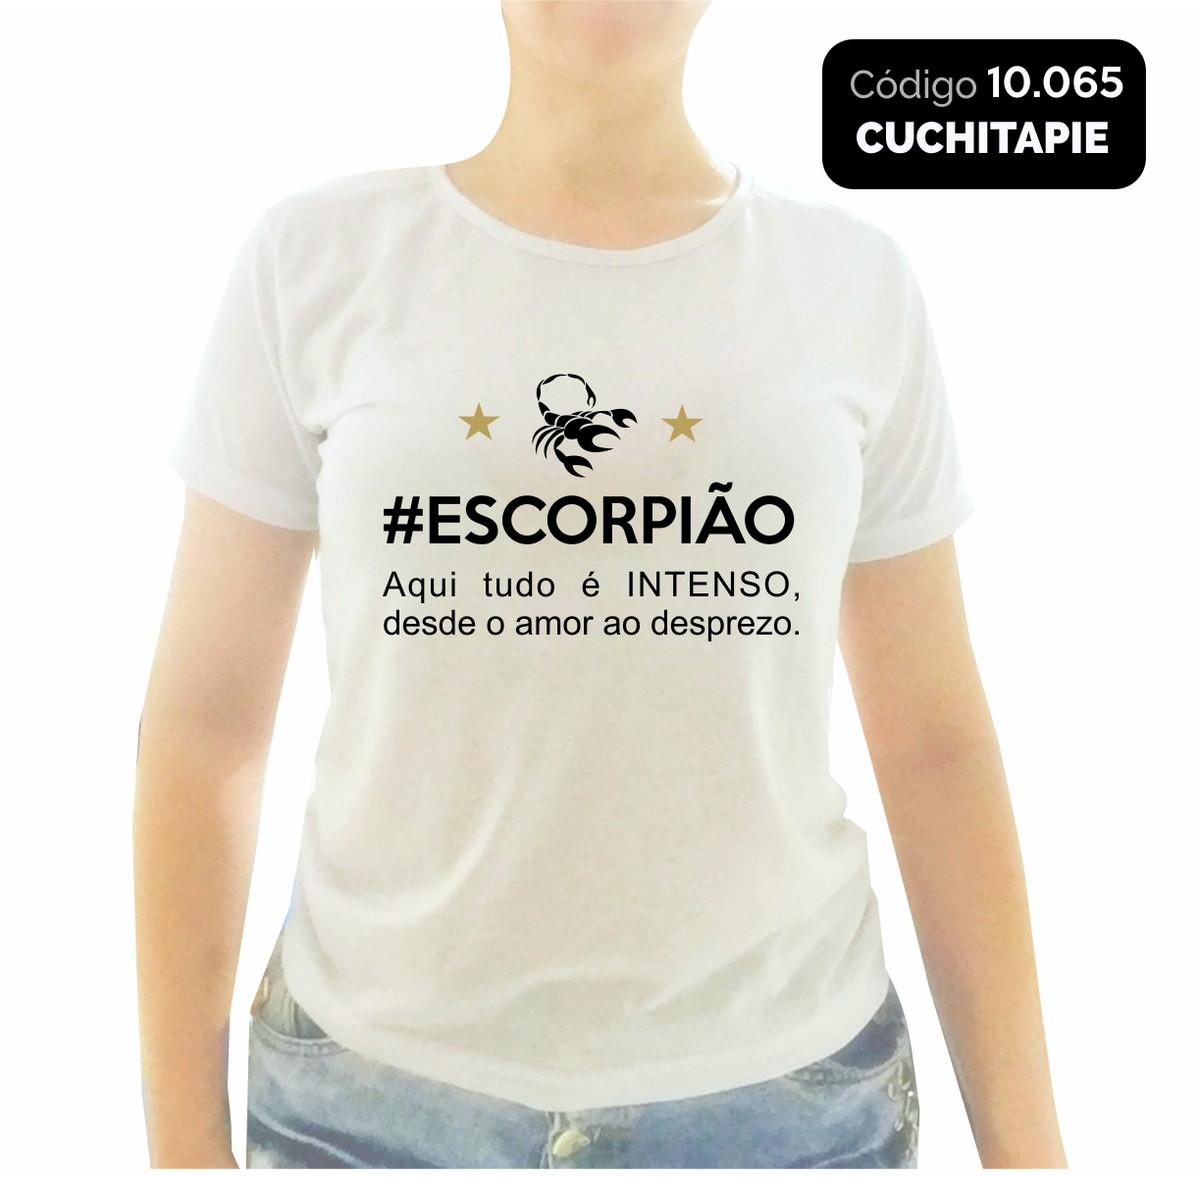 Baby Look Signo Escorpião Frase No Elo7 Cuchitapie Be01f0